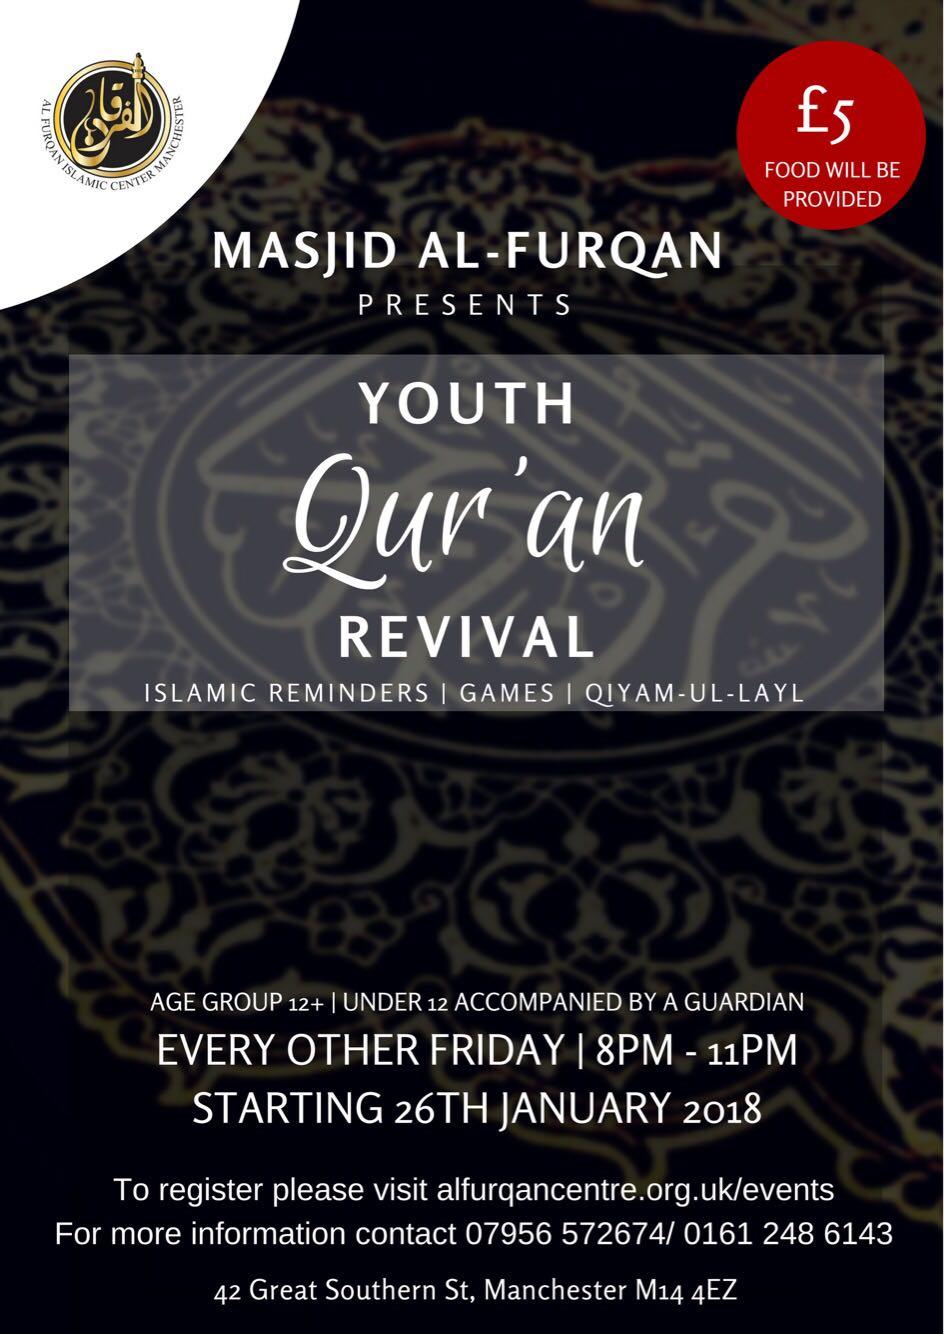 Youth Quran Revival